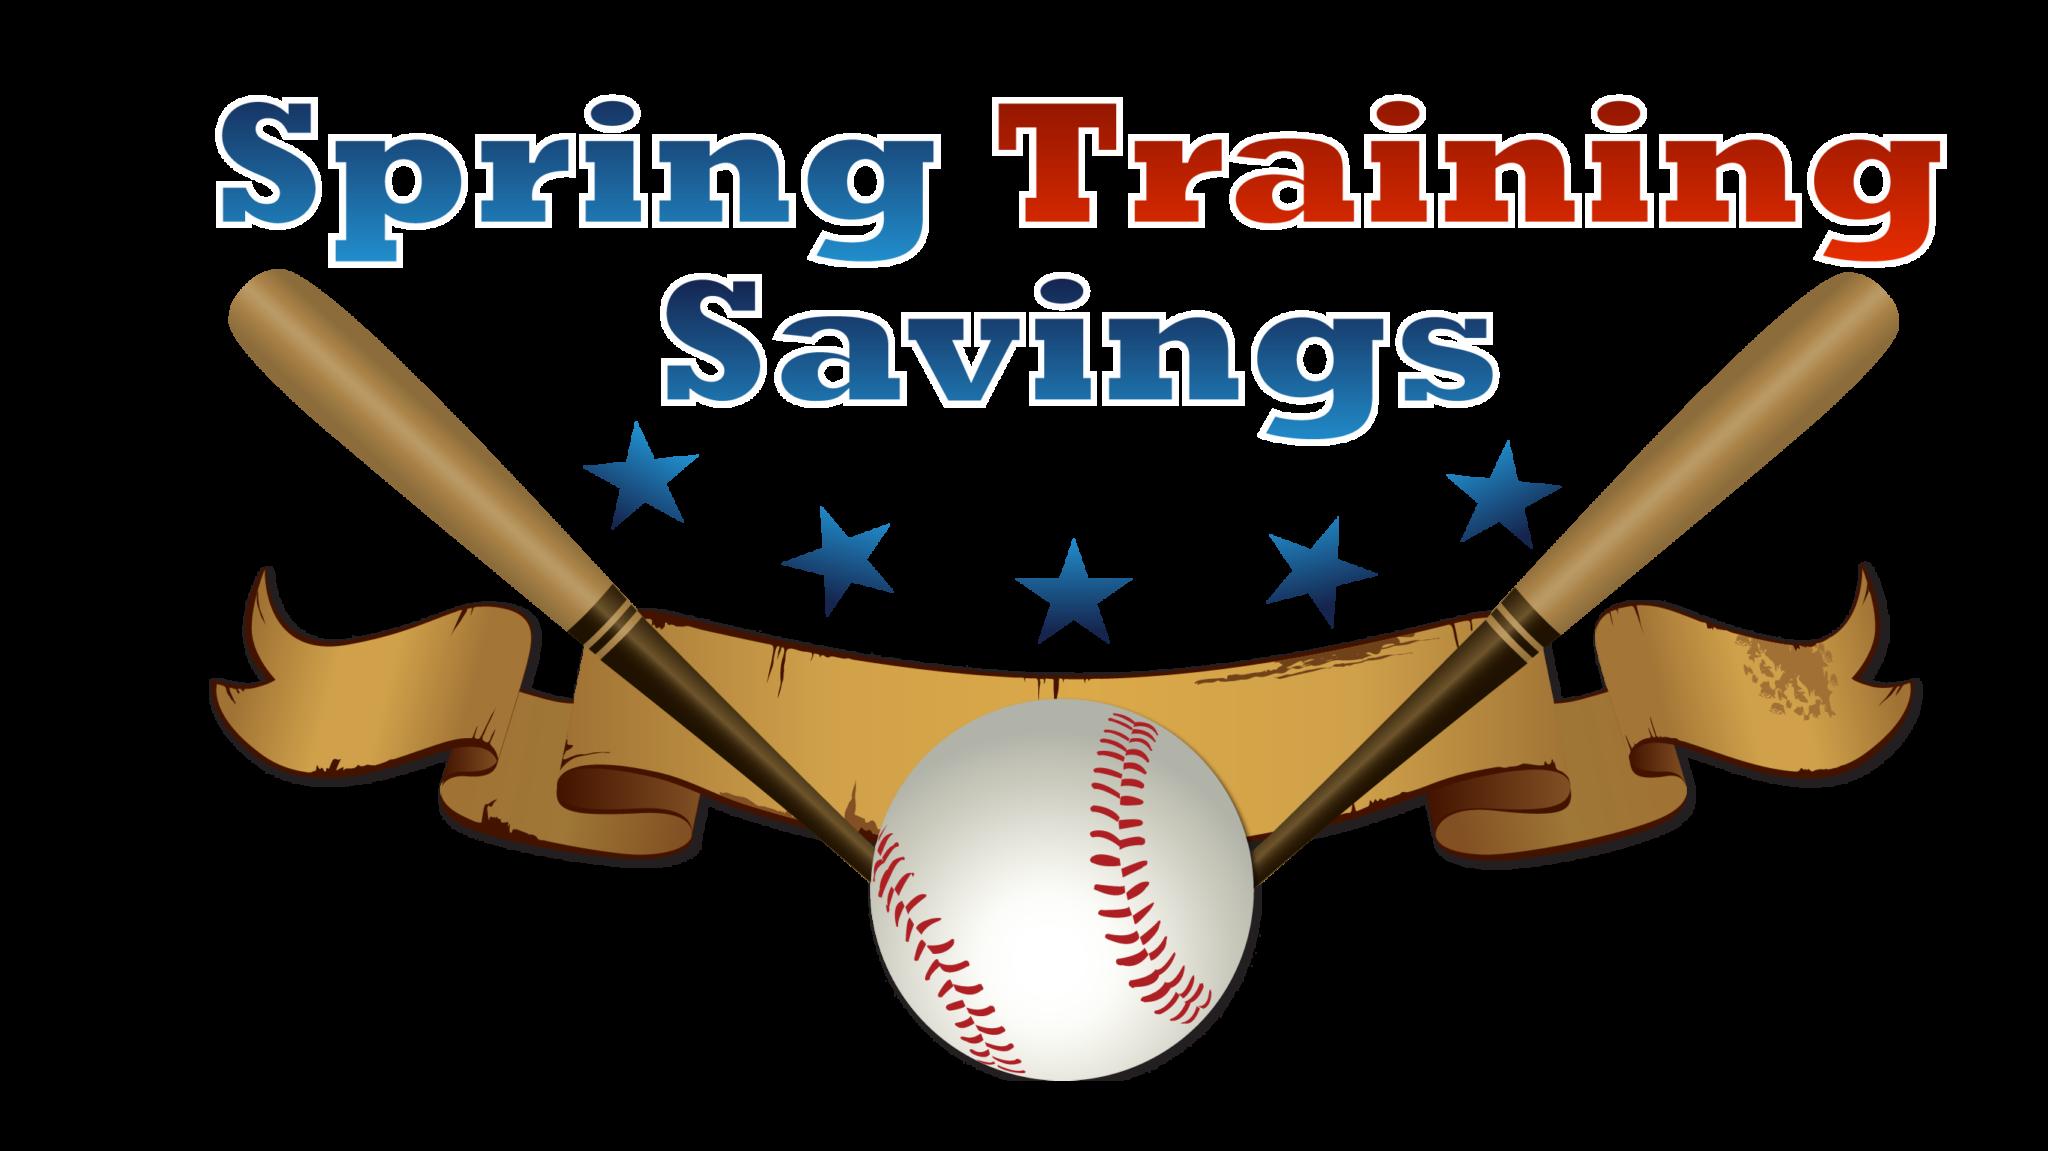 Grand slam baseball wording clipart transparent stock Contest End - Grand Slam of Savings transparent stock